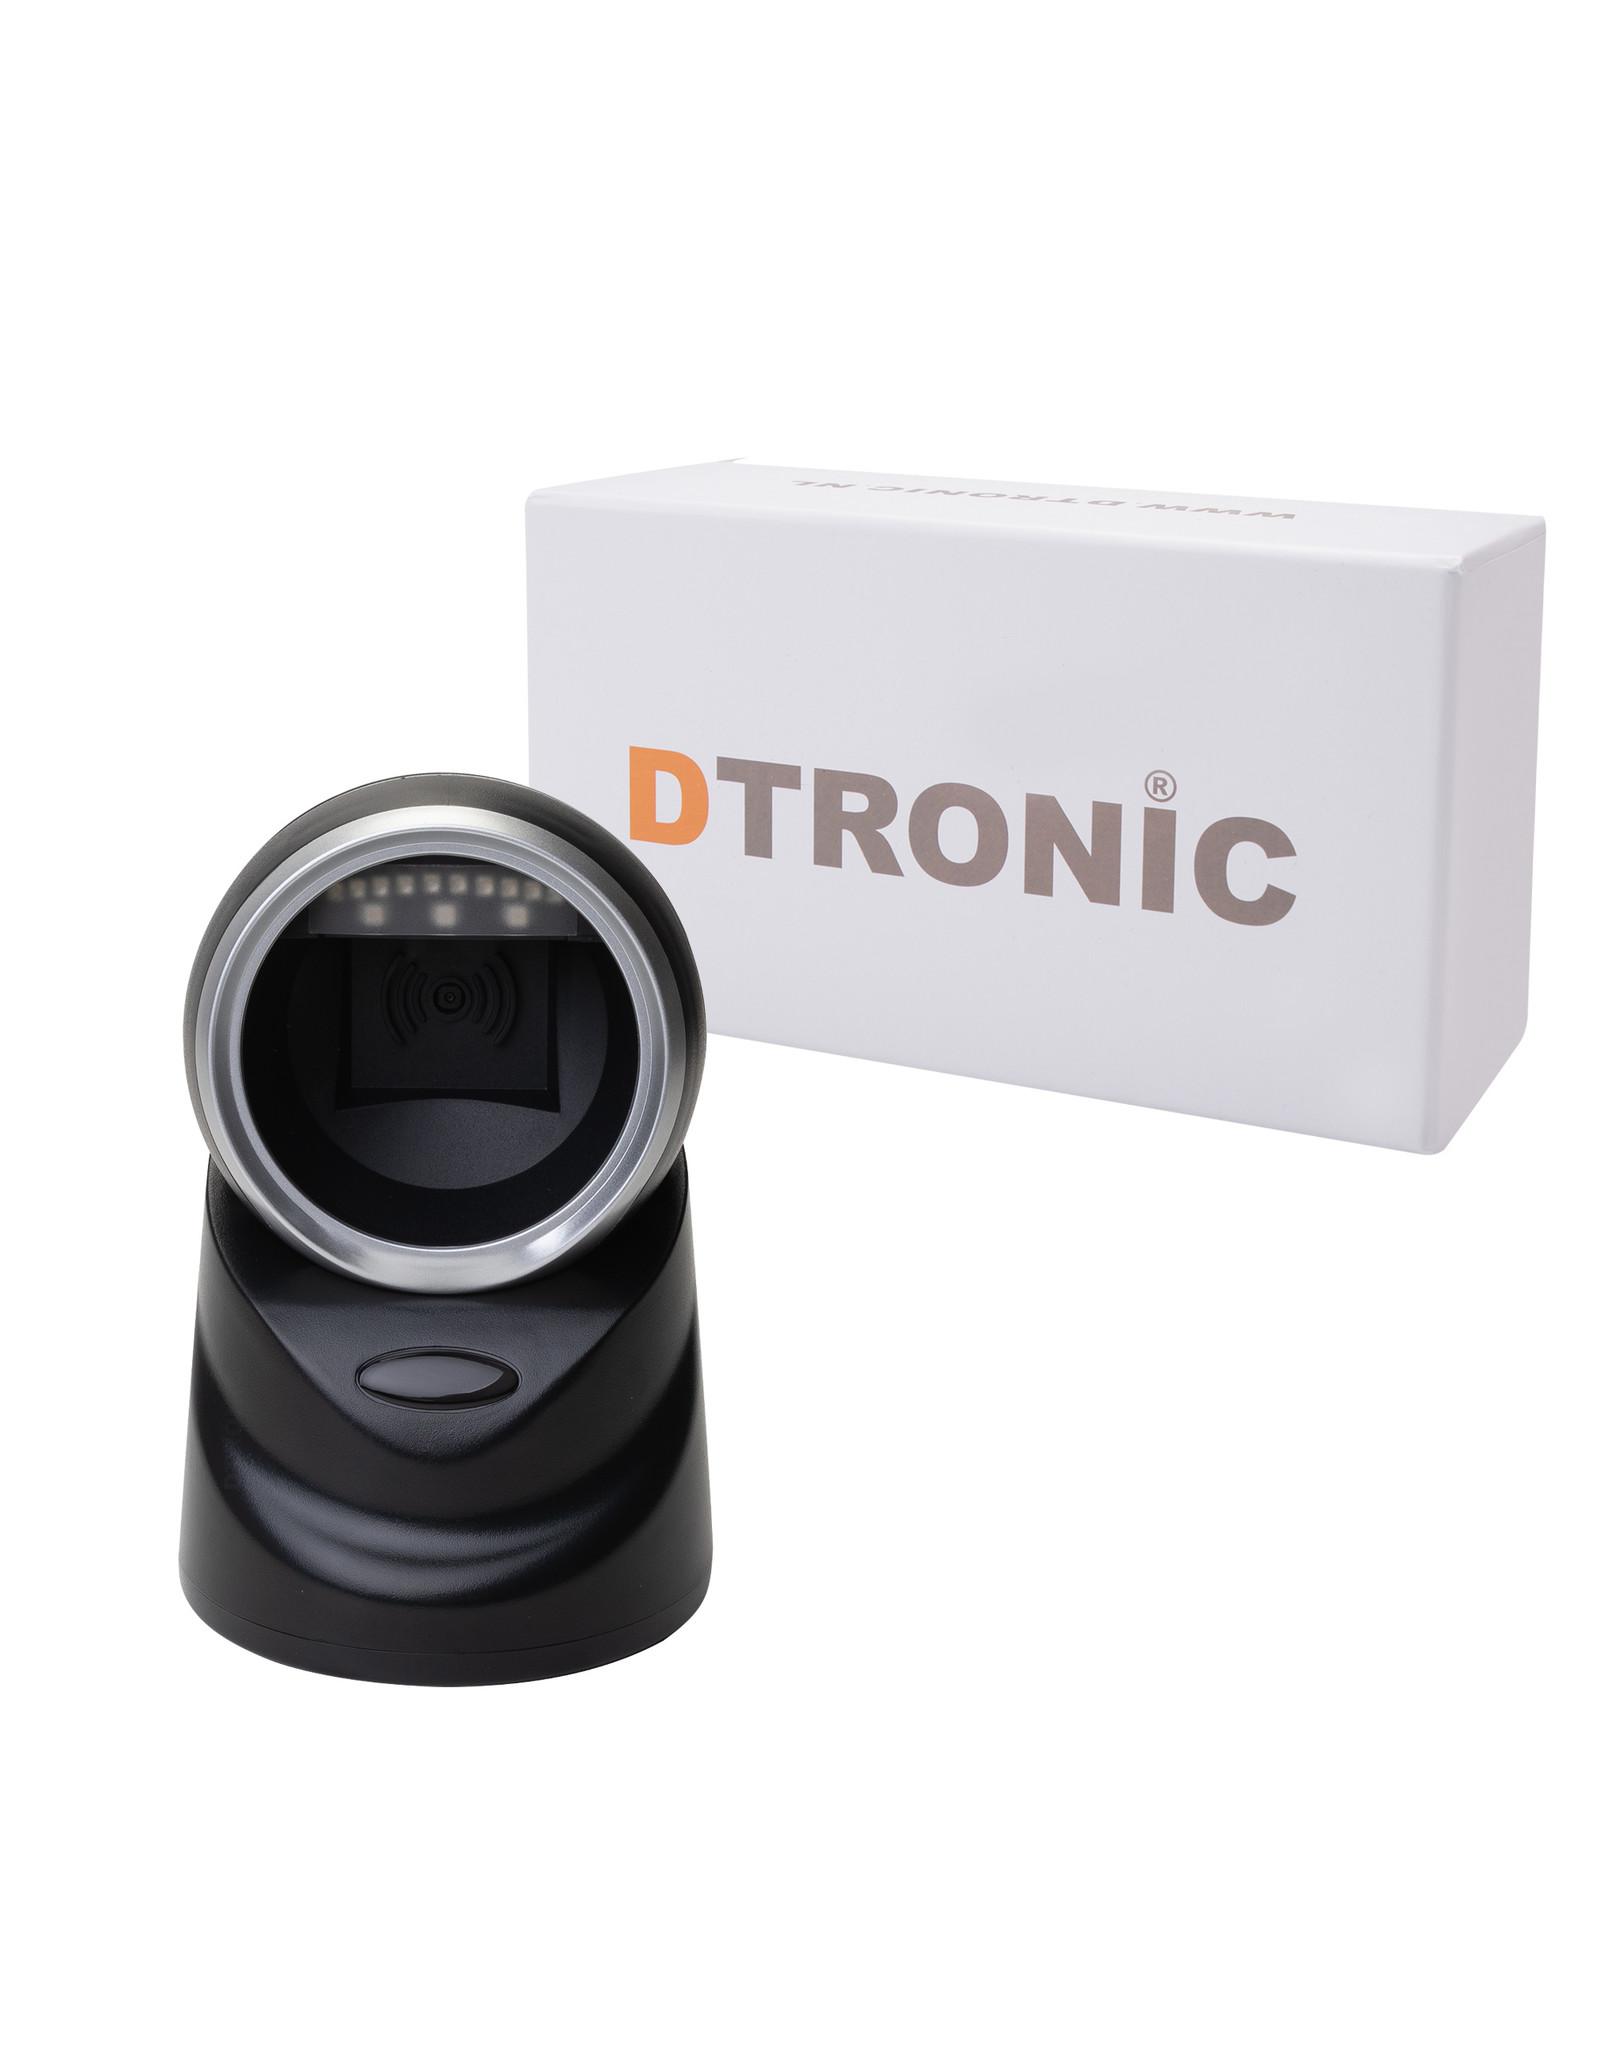 DTRONIC DTONIC - DT8500